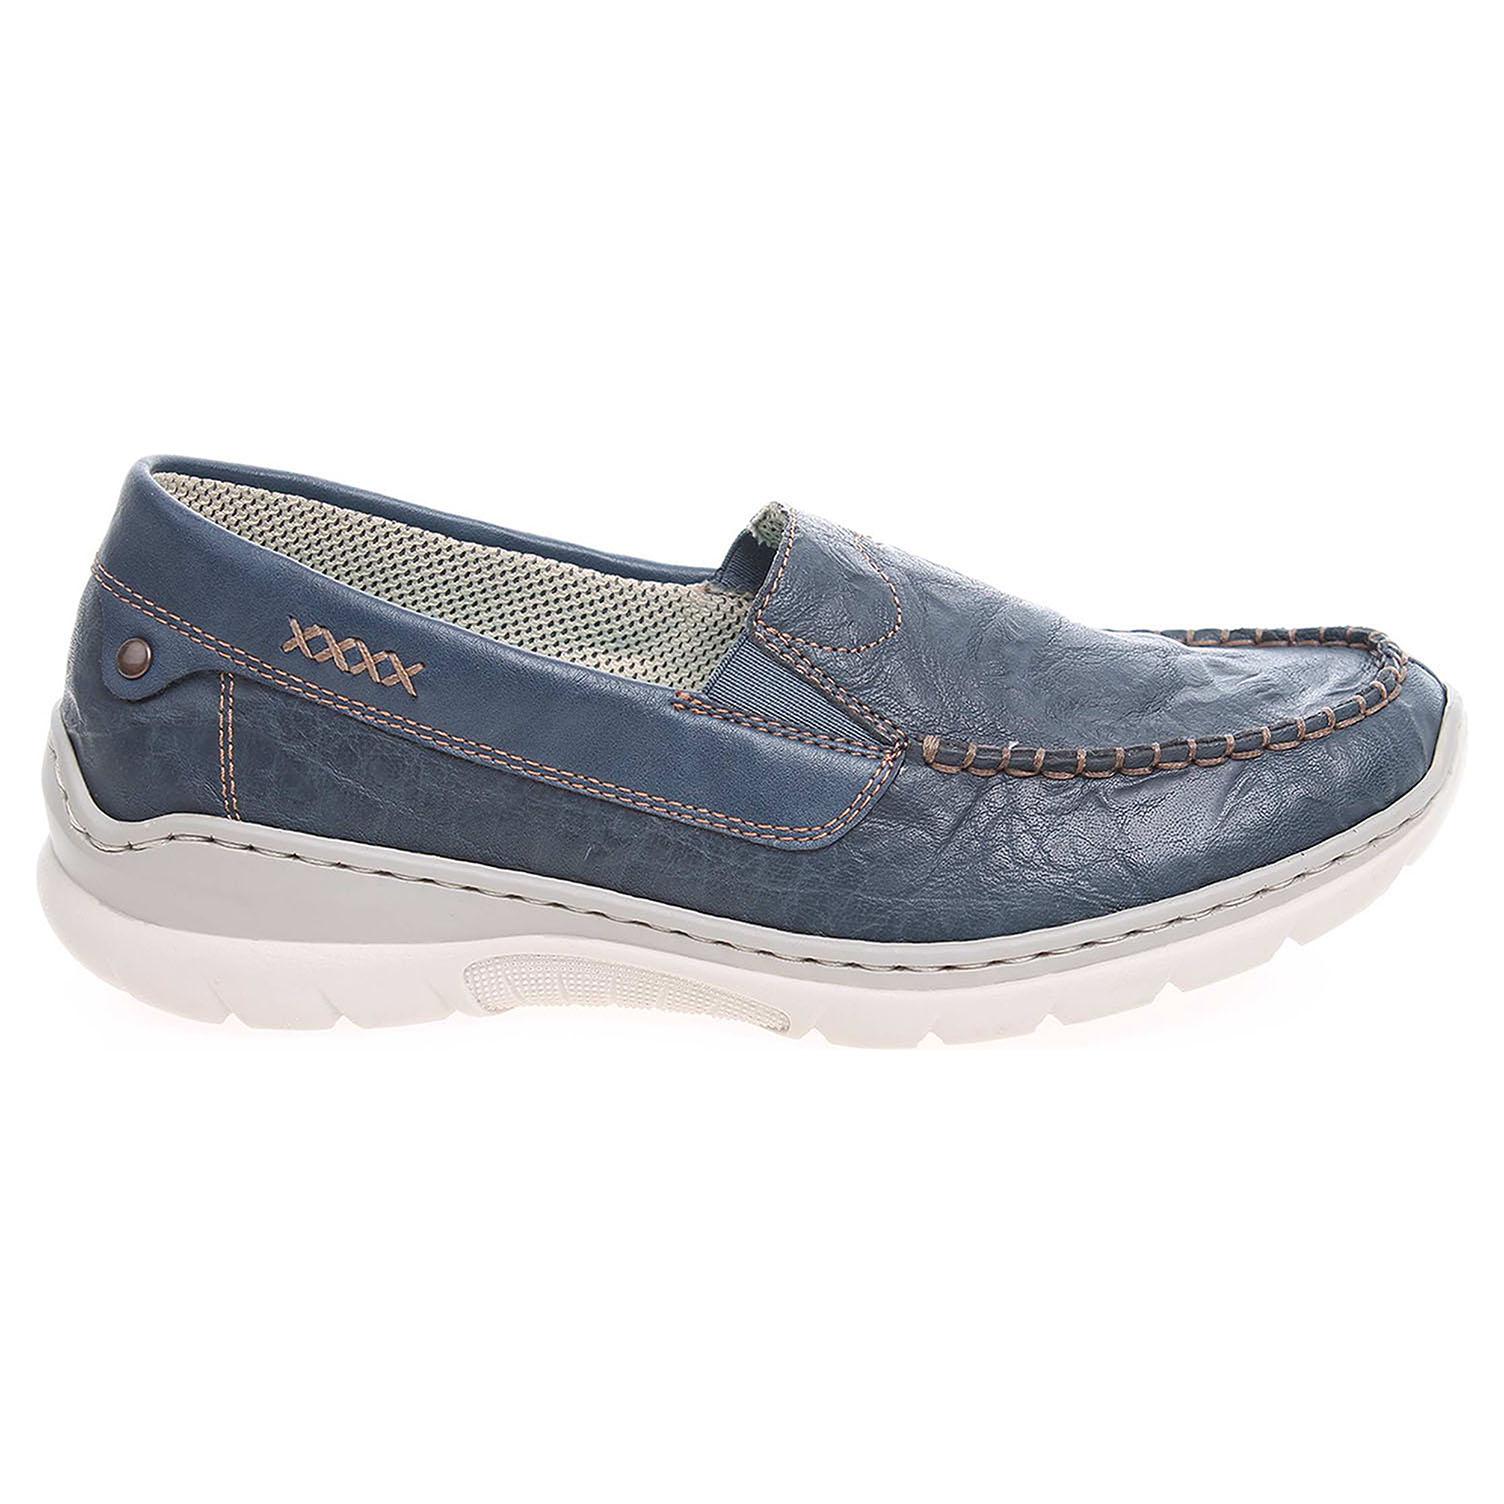 bfec4f7da0bdd Rieker dámské mokasiny L3270-14 modré | Rejnok obuv